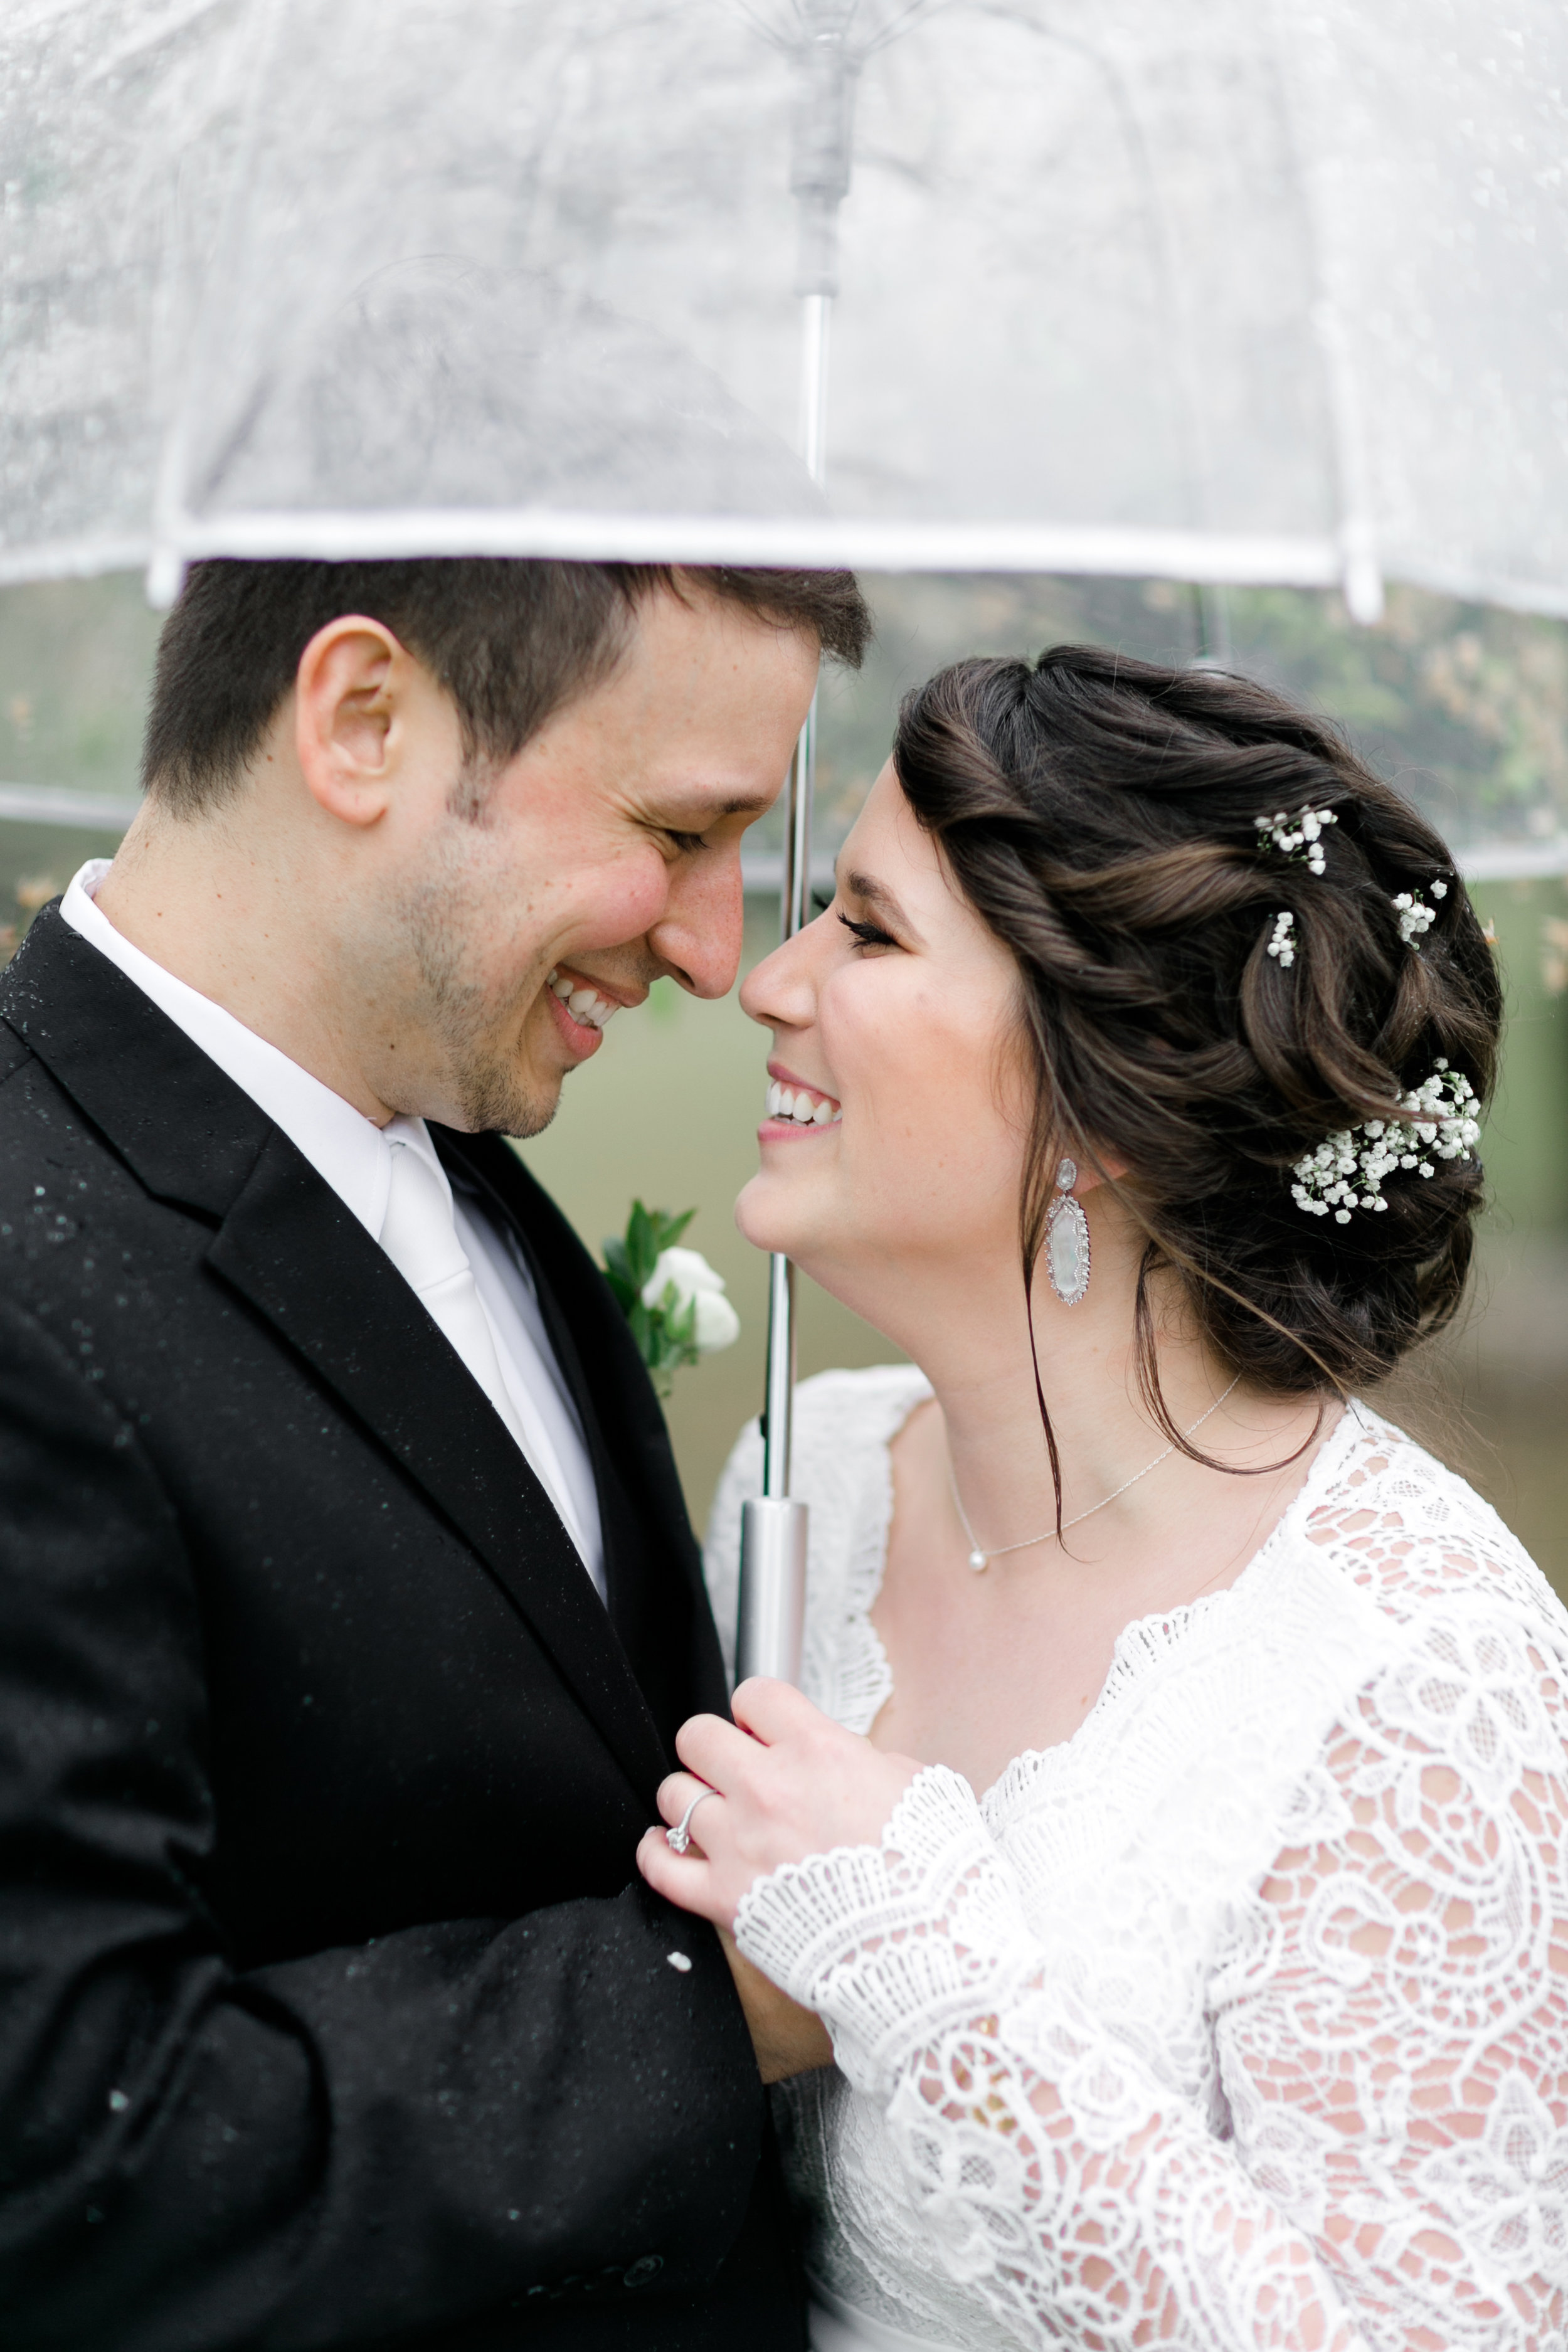 Austin_Texas_Fine_Art_Wedding_Photographer_Kayla_Snell_Photography_Antebellum_Oaks238.jpg